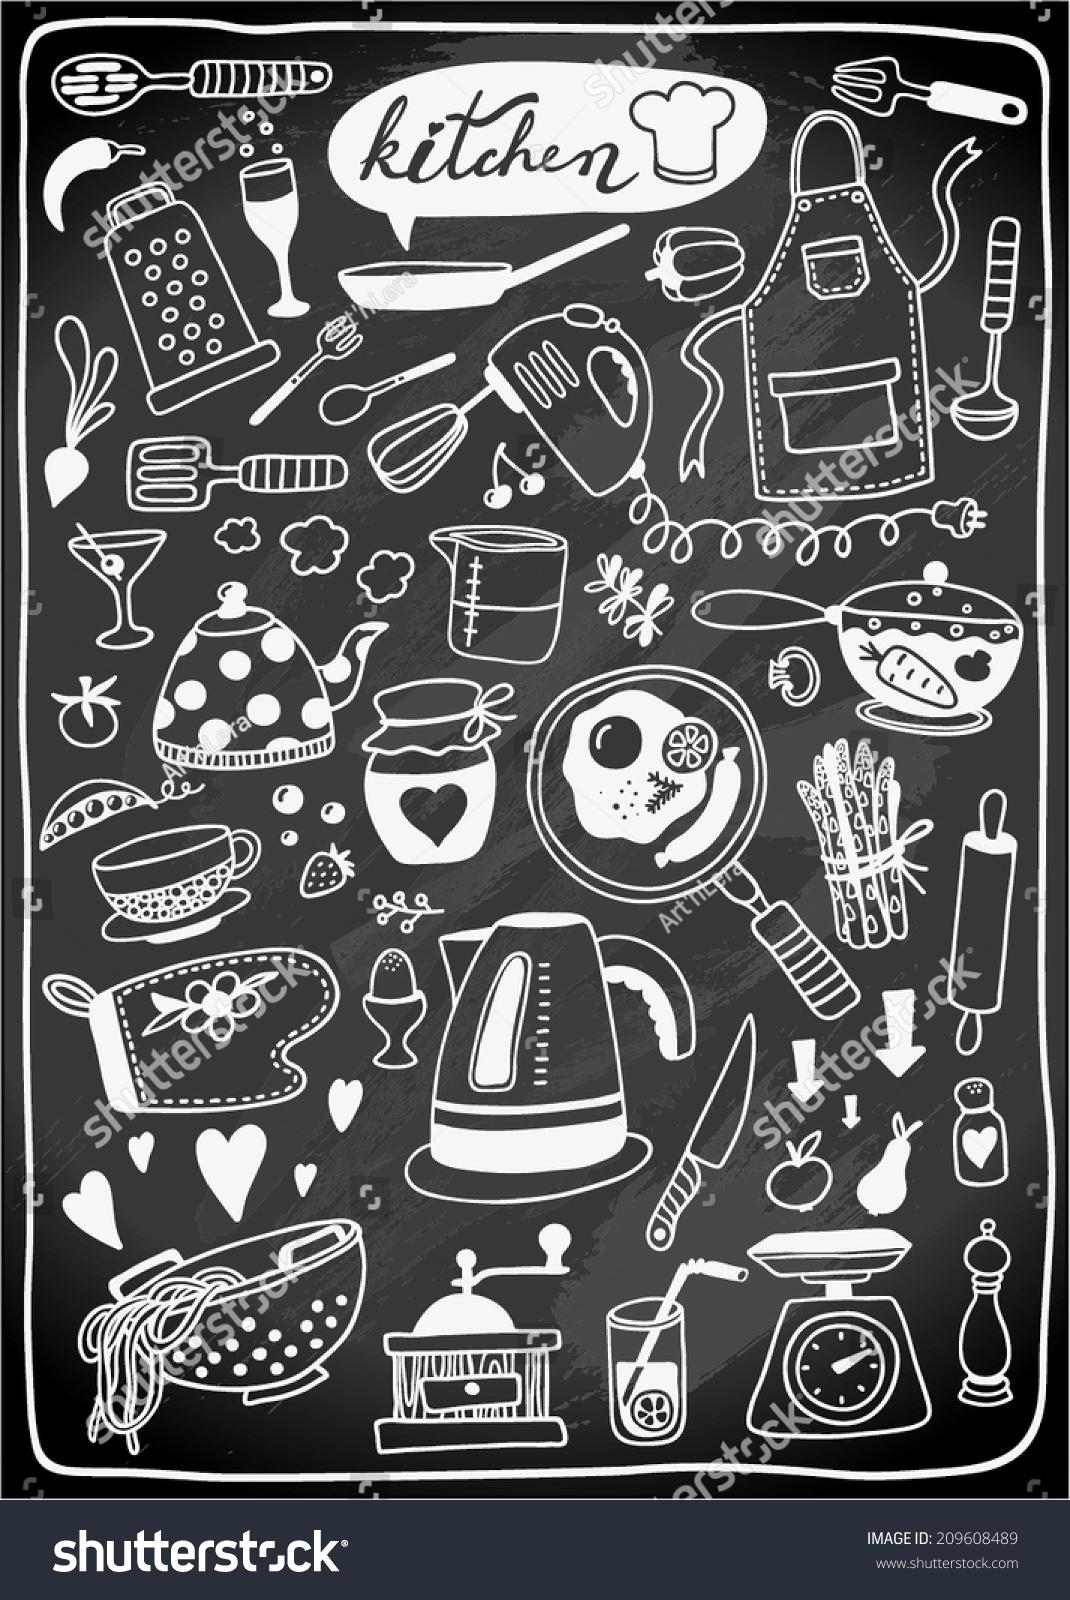 Chalkboard Kitchen Handdrawn Doodle Kitchen Utensils On Chalkboard Stock Vector